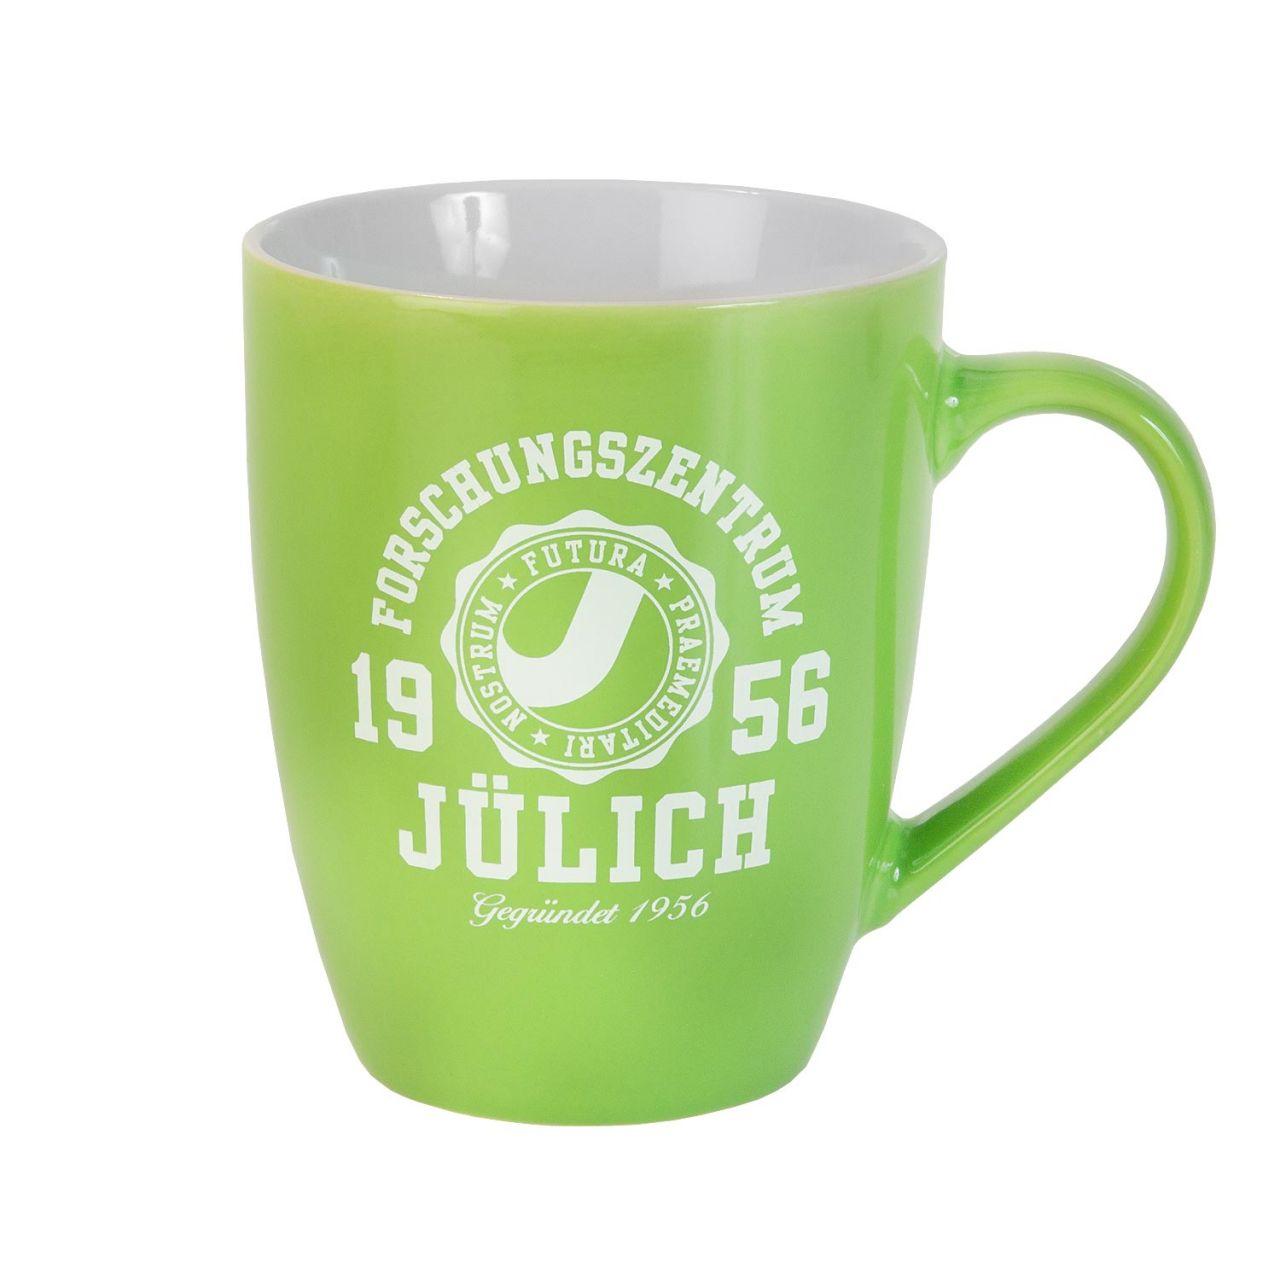 Ceramic Mug, green, marshall